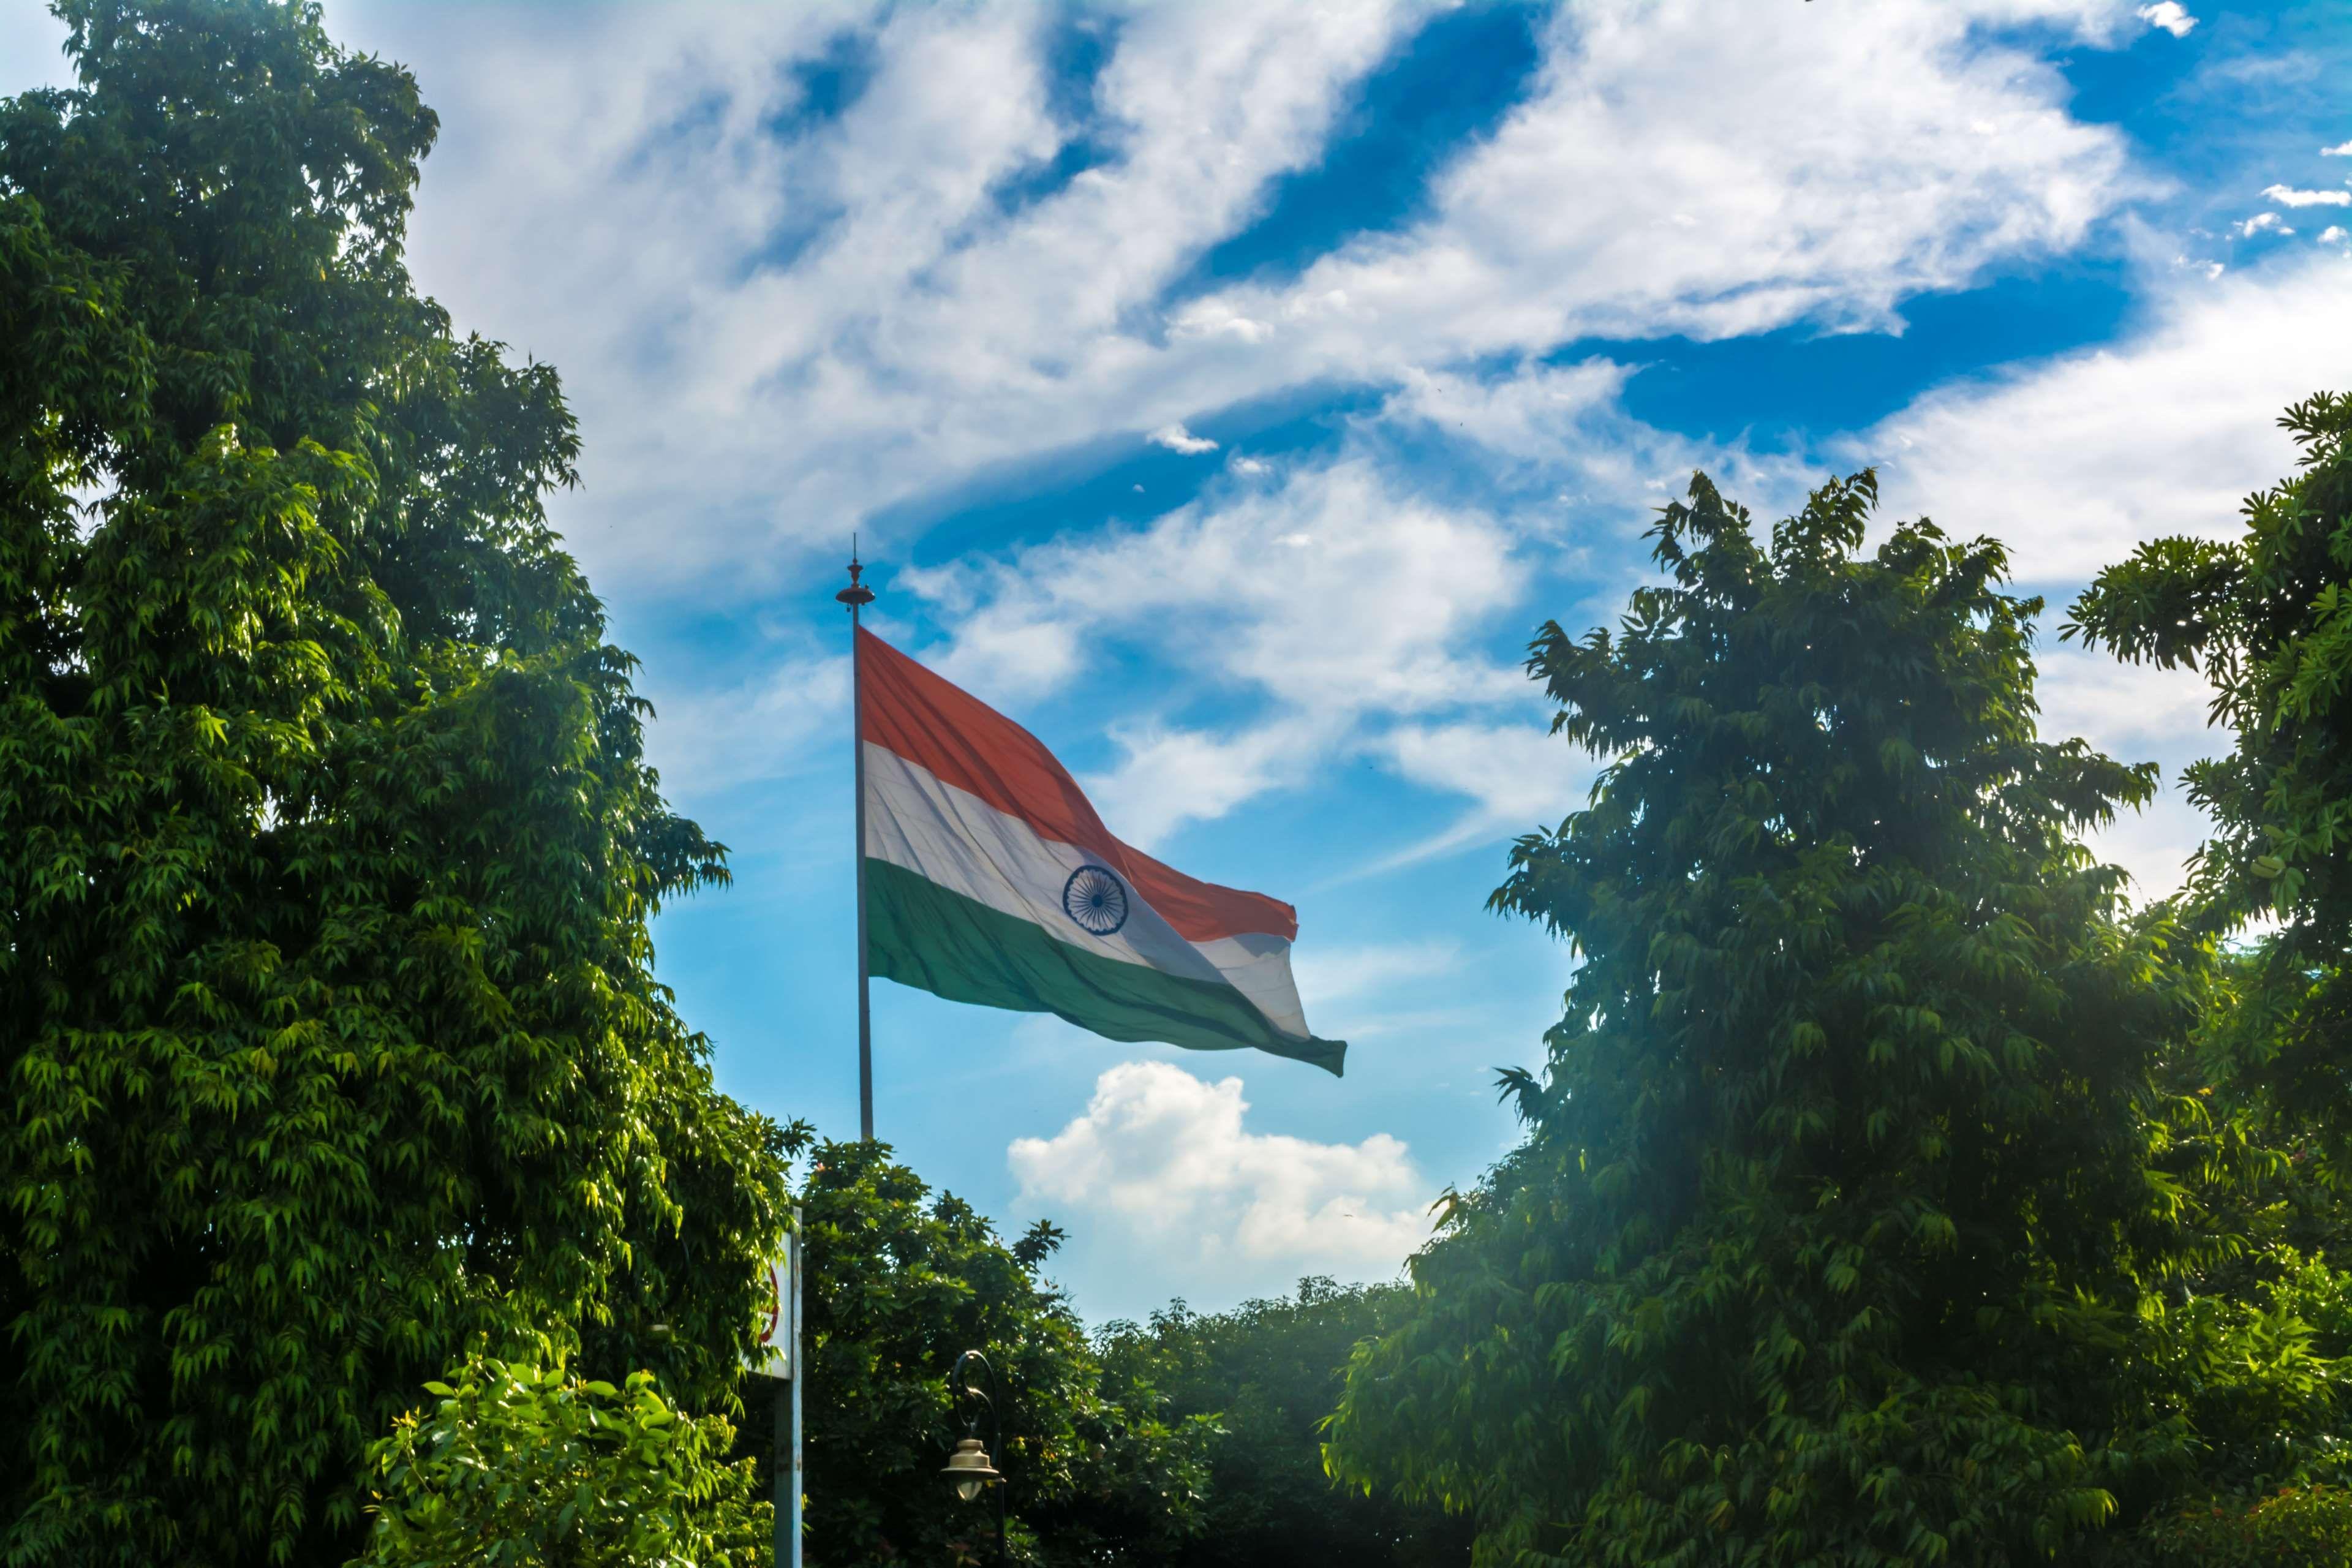 Ashok Ashok Chakra Blue Chakra Clouds Flag Green India Indian Indian Flag Orange Sunlight Sunshine Tiranga Trees Tricolor 4k Wallpaper Indian Flag Wallpaper Tri Color